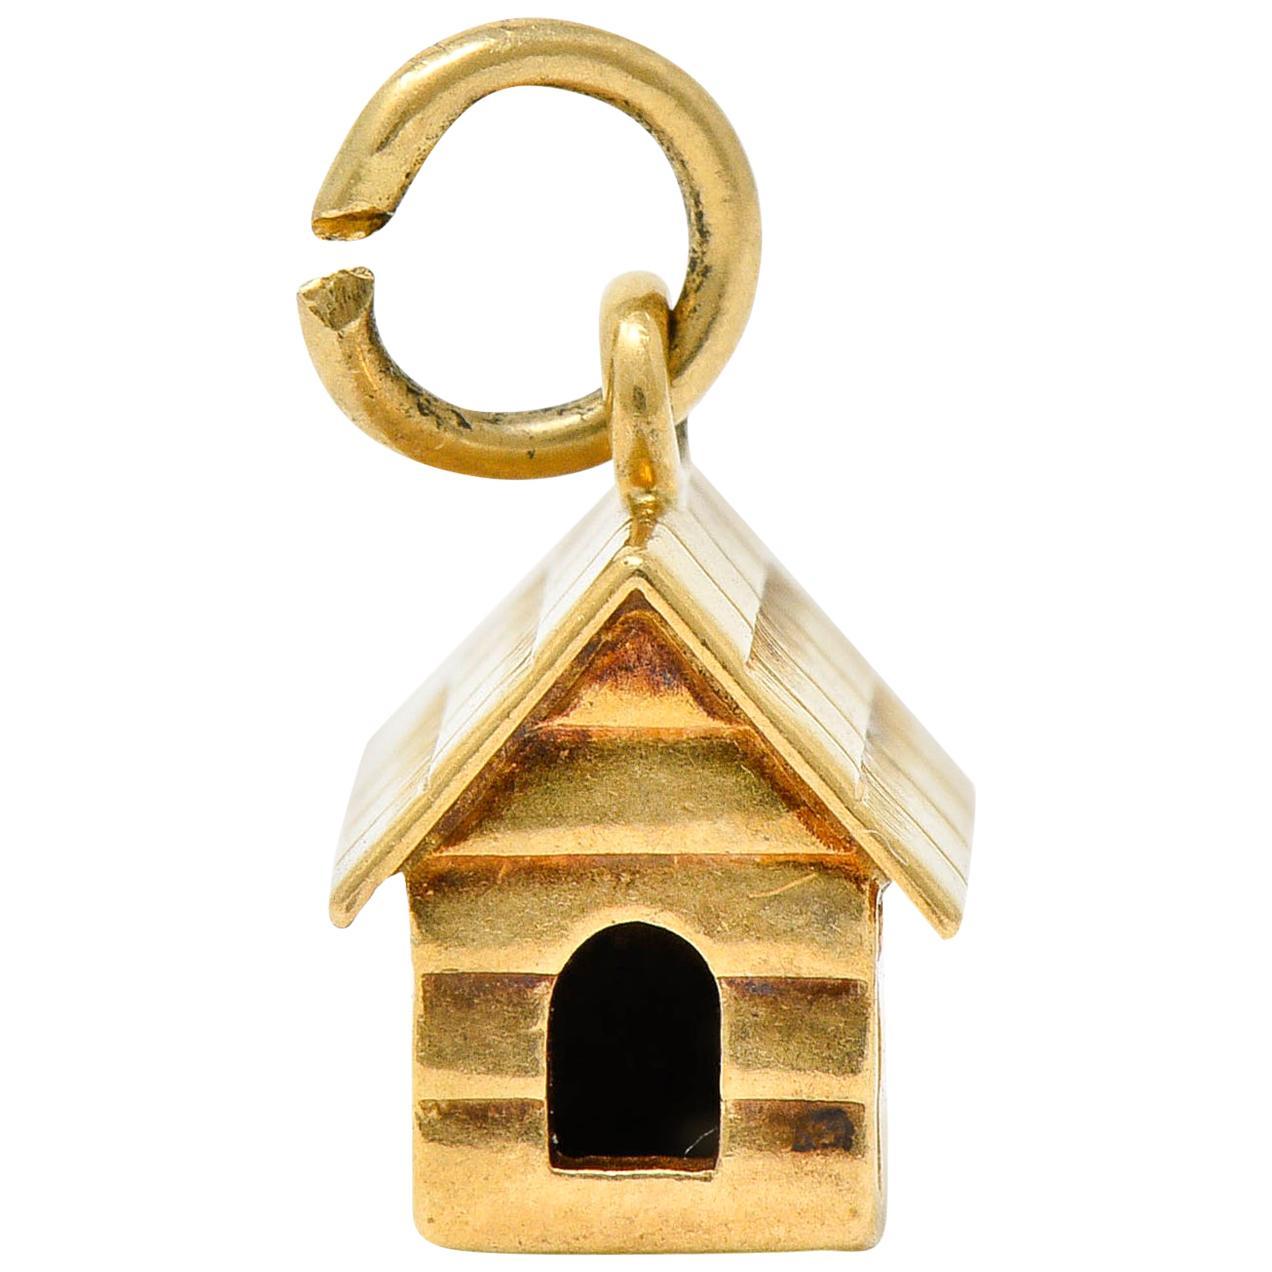 Retro 14 Karat Gold Doghouse Charm, circa 1950